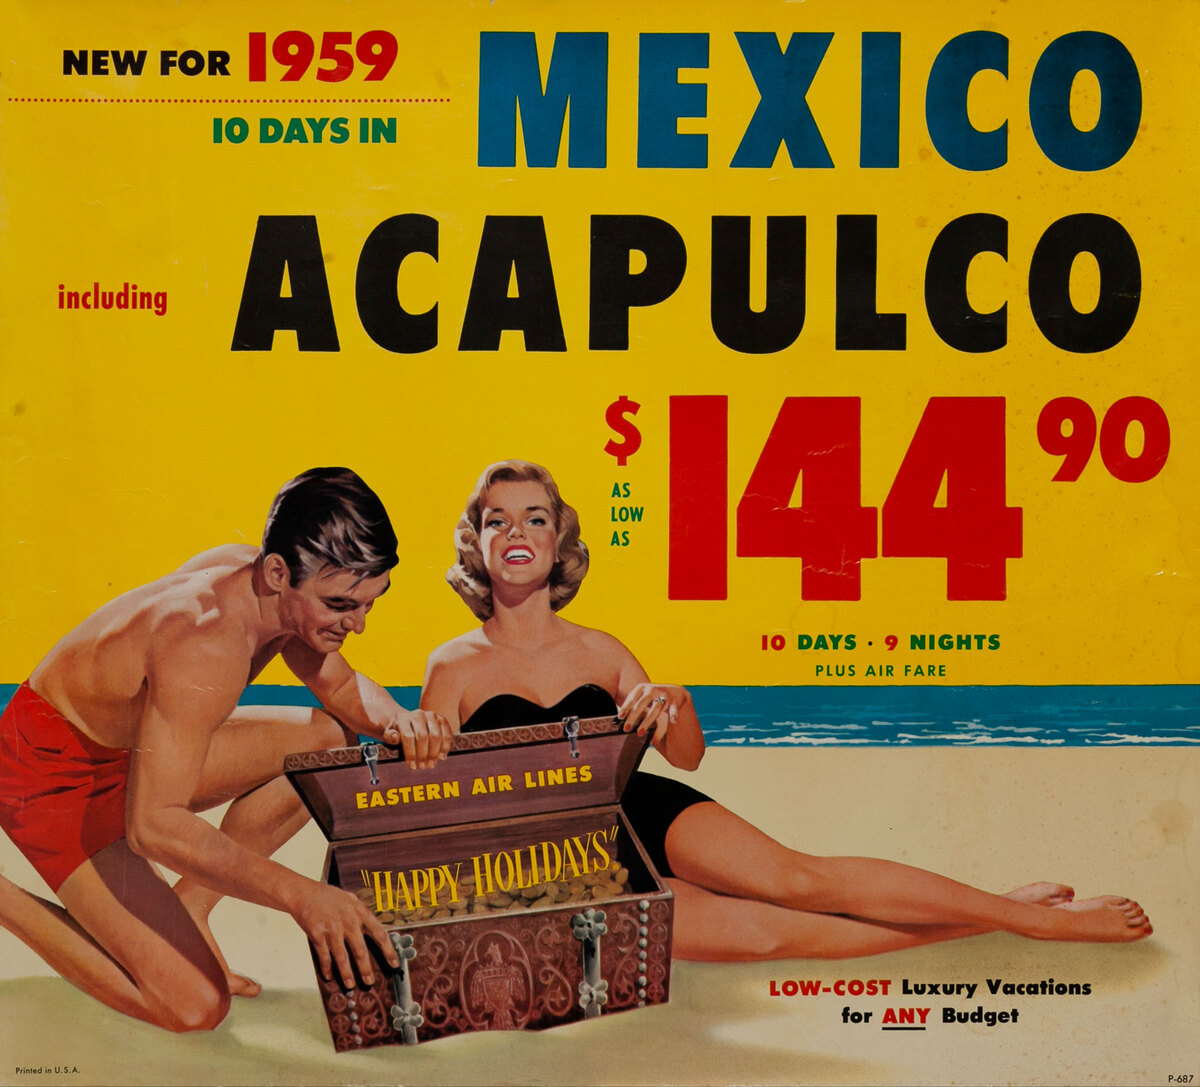 Acapulco Original Vintage Eastern Air Lines Travel Poster